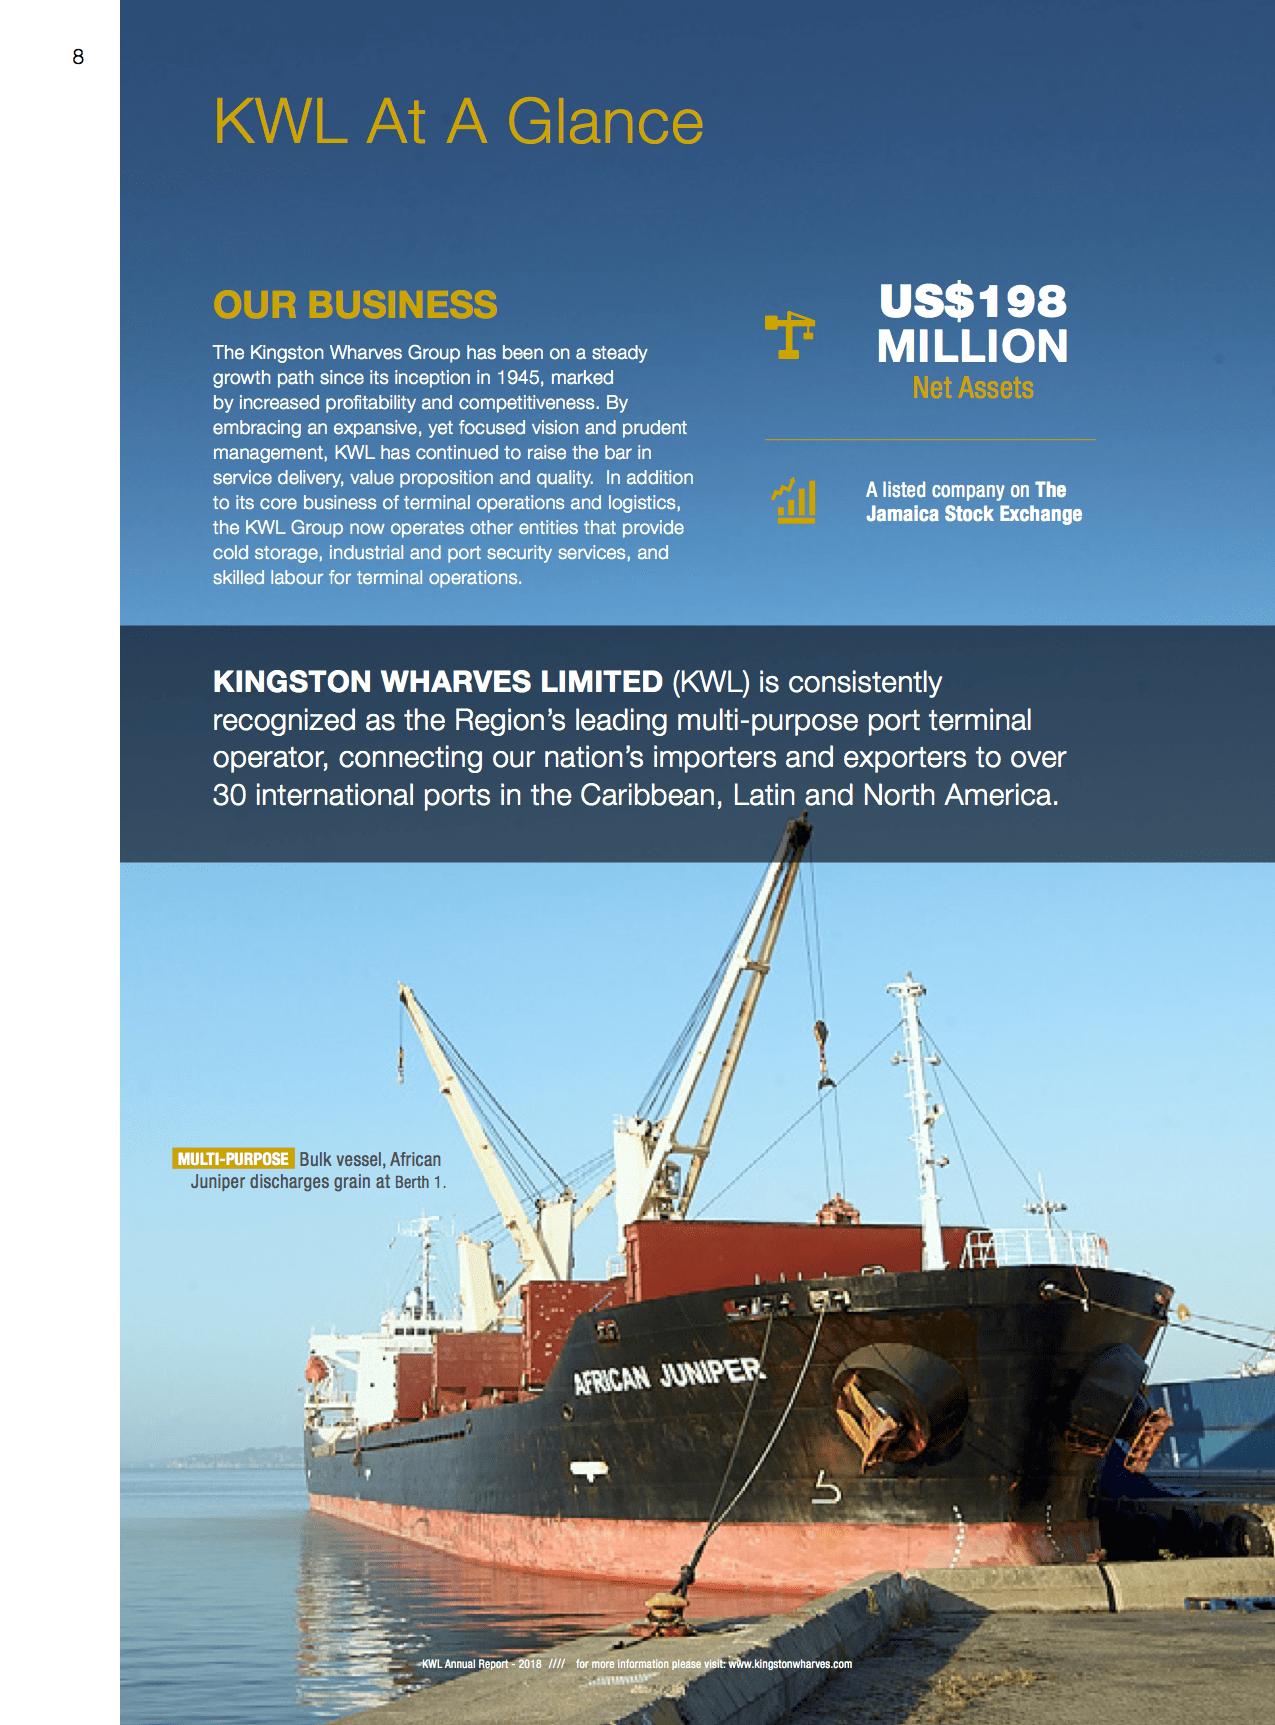 Investor Relations - Kingston Wharves Limited |